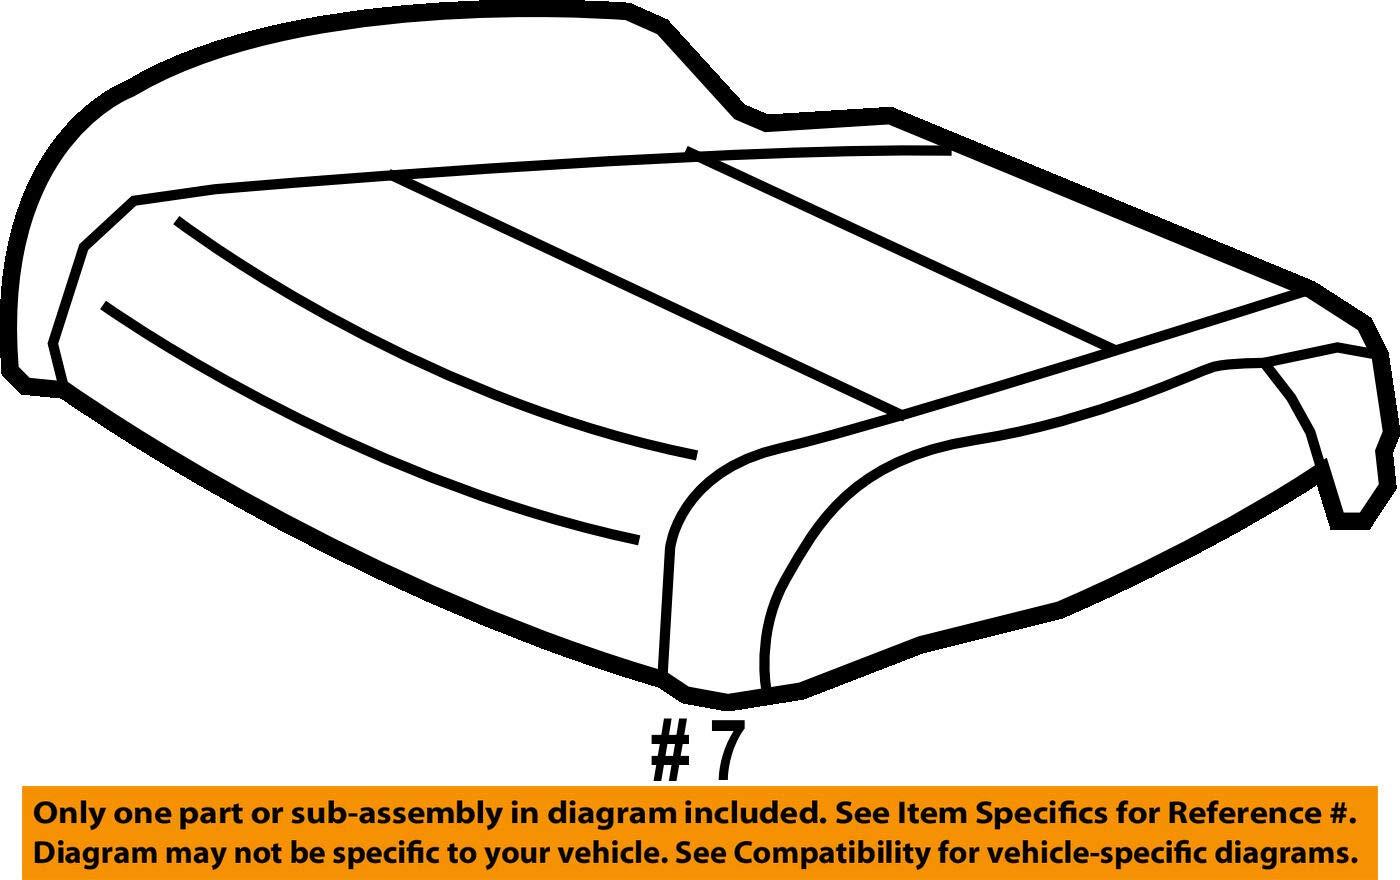 Genuine Hyundai 84540-2H600-9P Glove Box Housing Cover Assembly